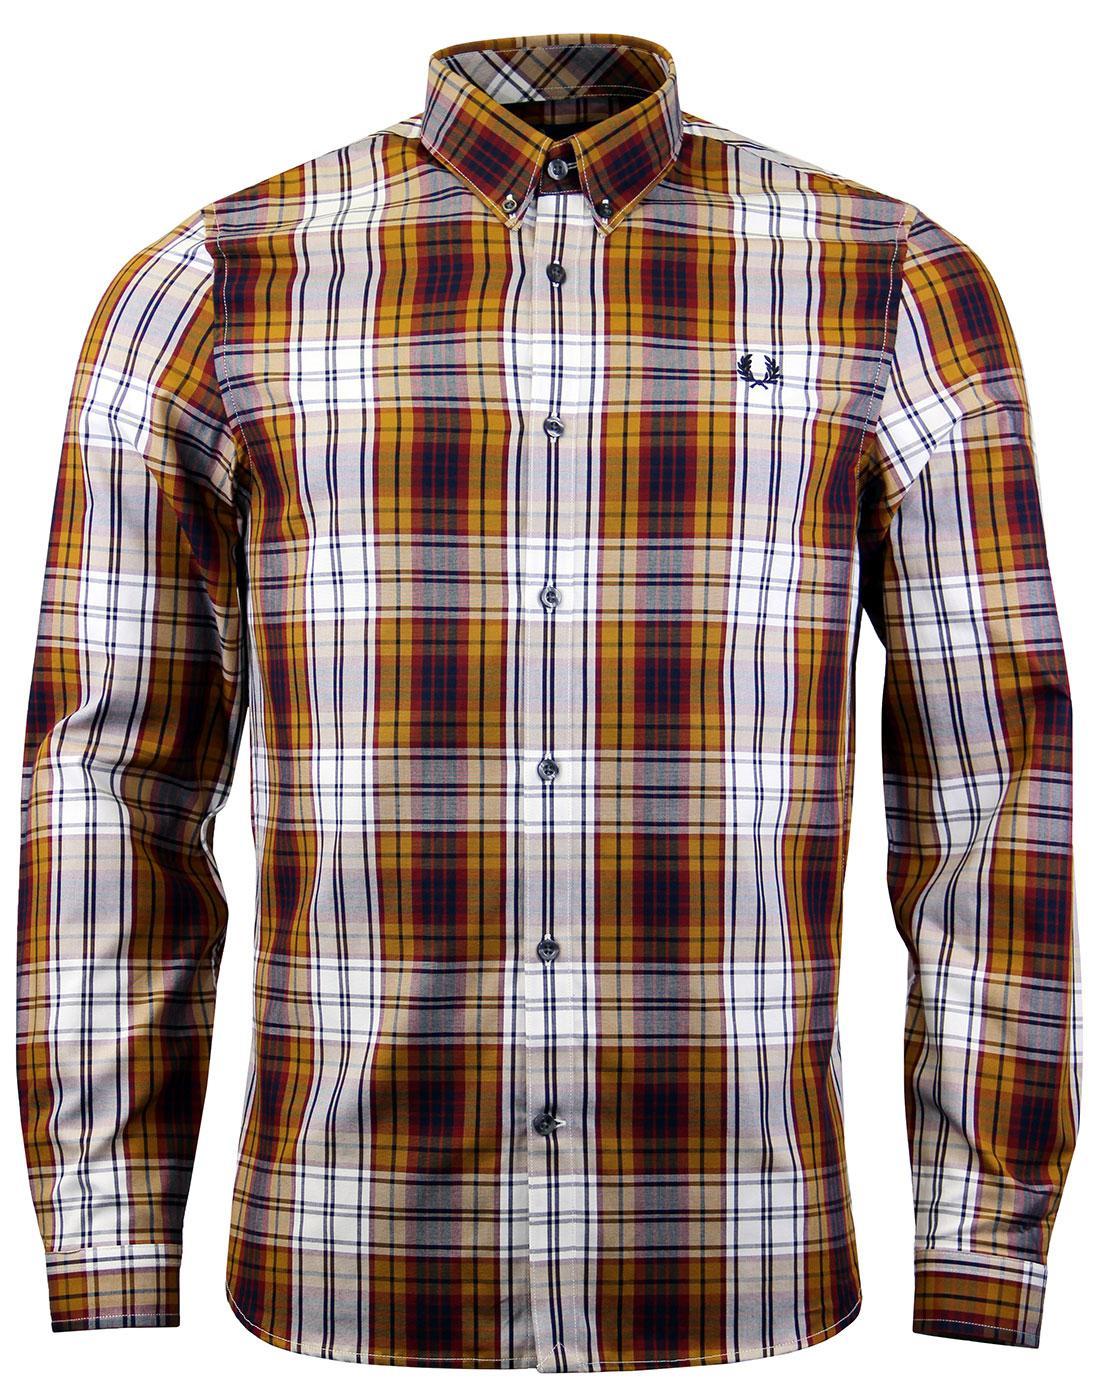 FRED PERRY Retro Mod Bold Check Tartan Shirt (Mu)